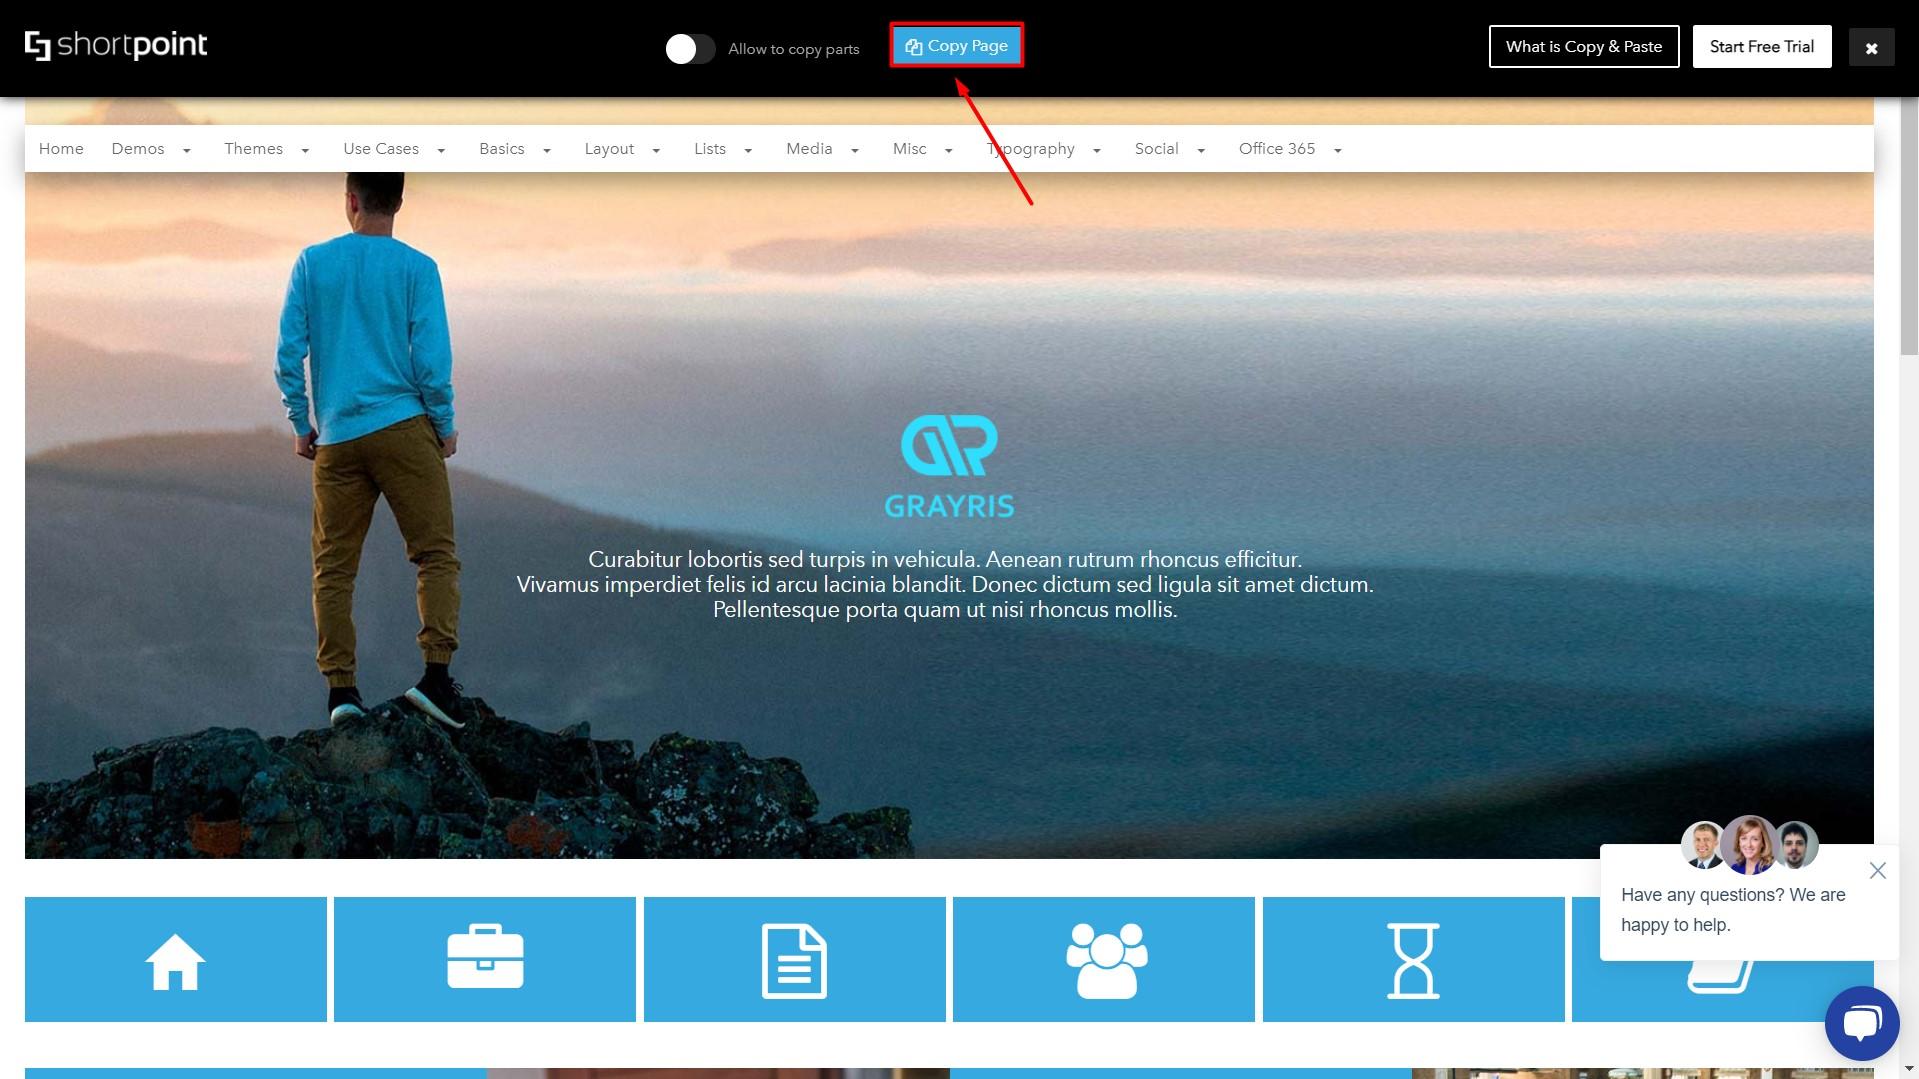 copy page button